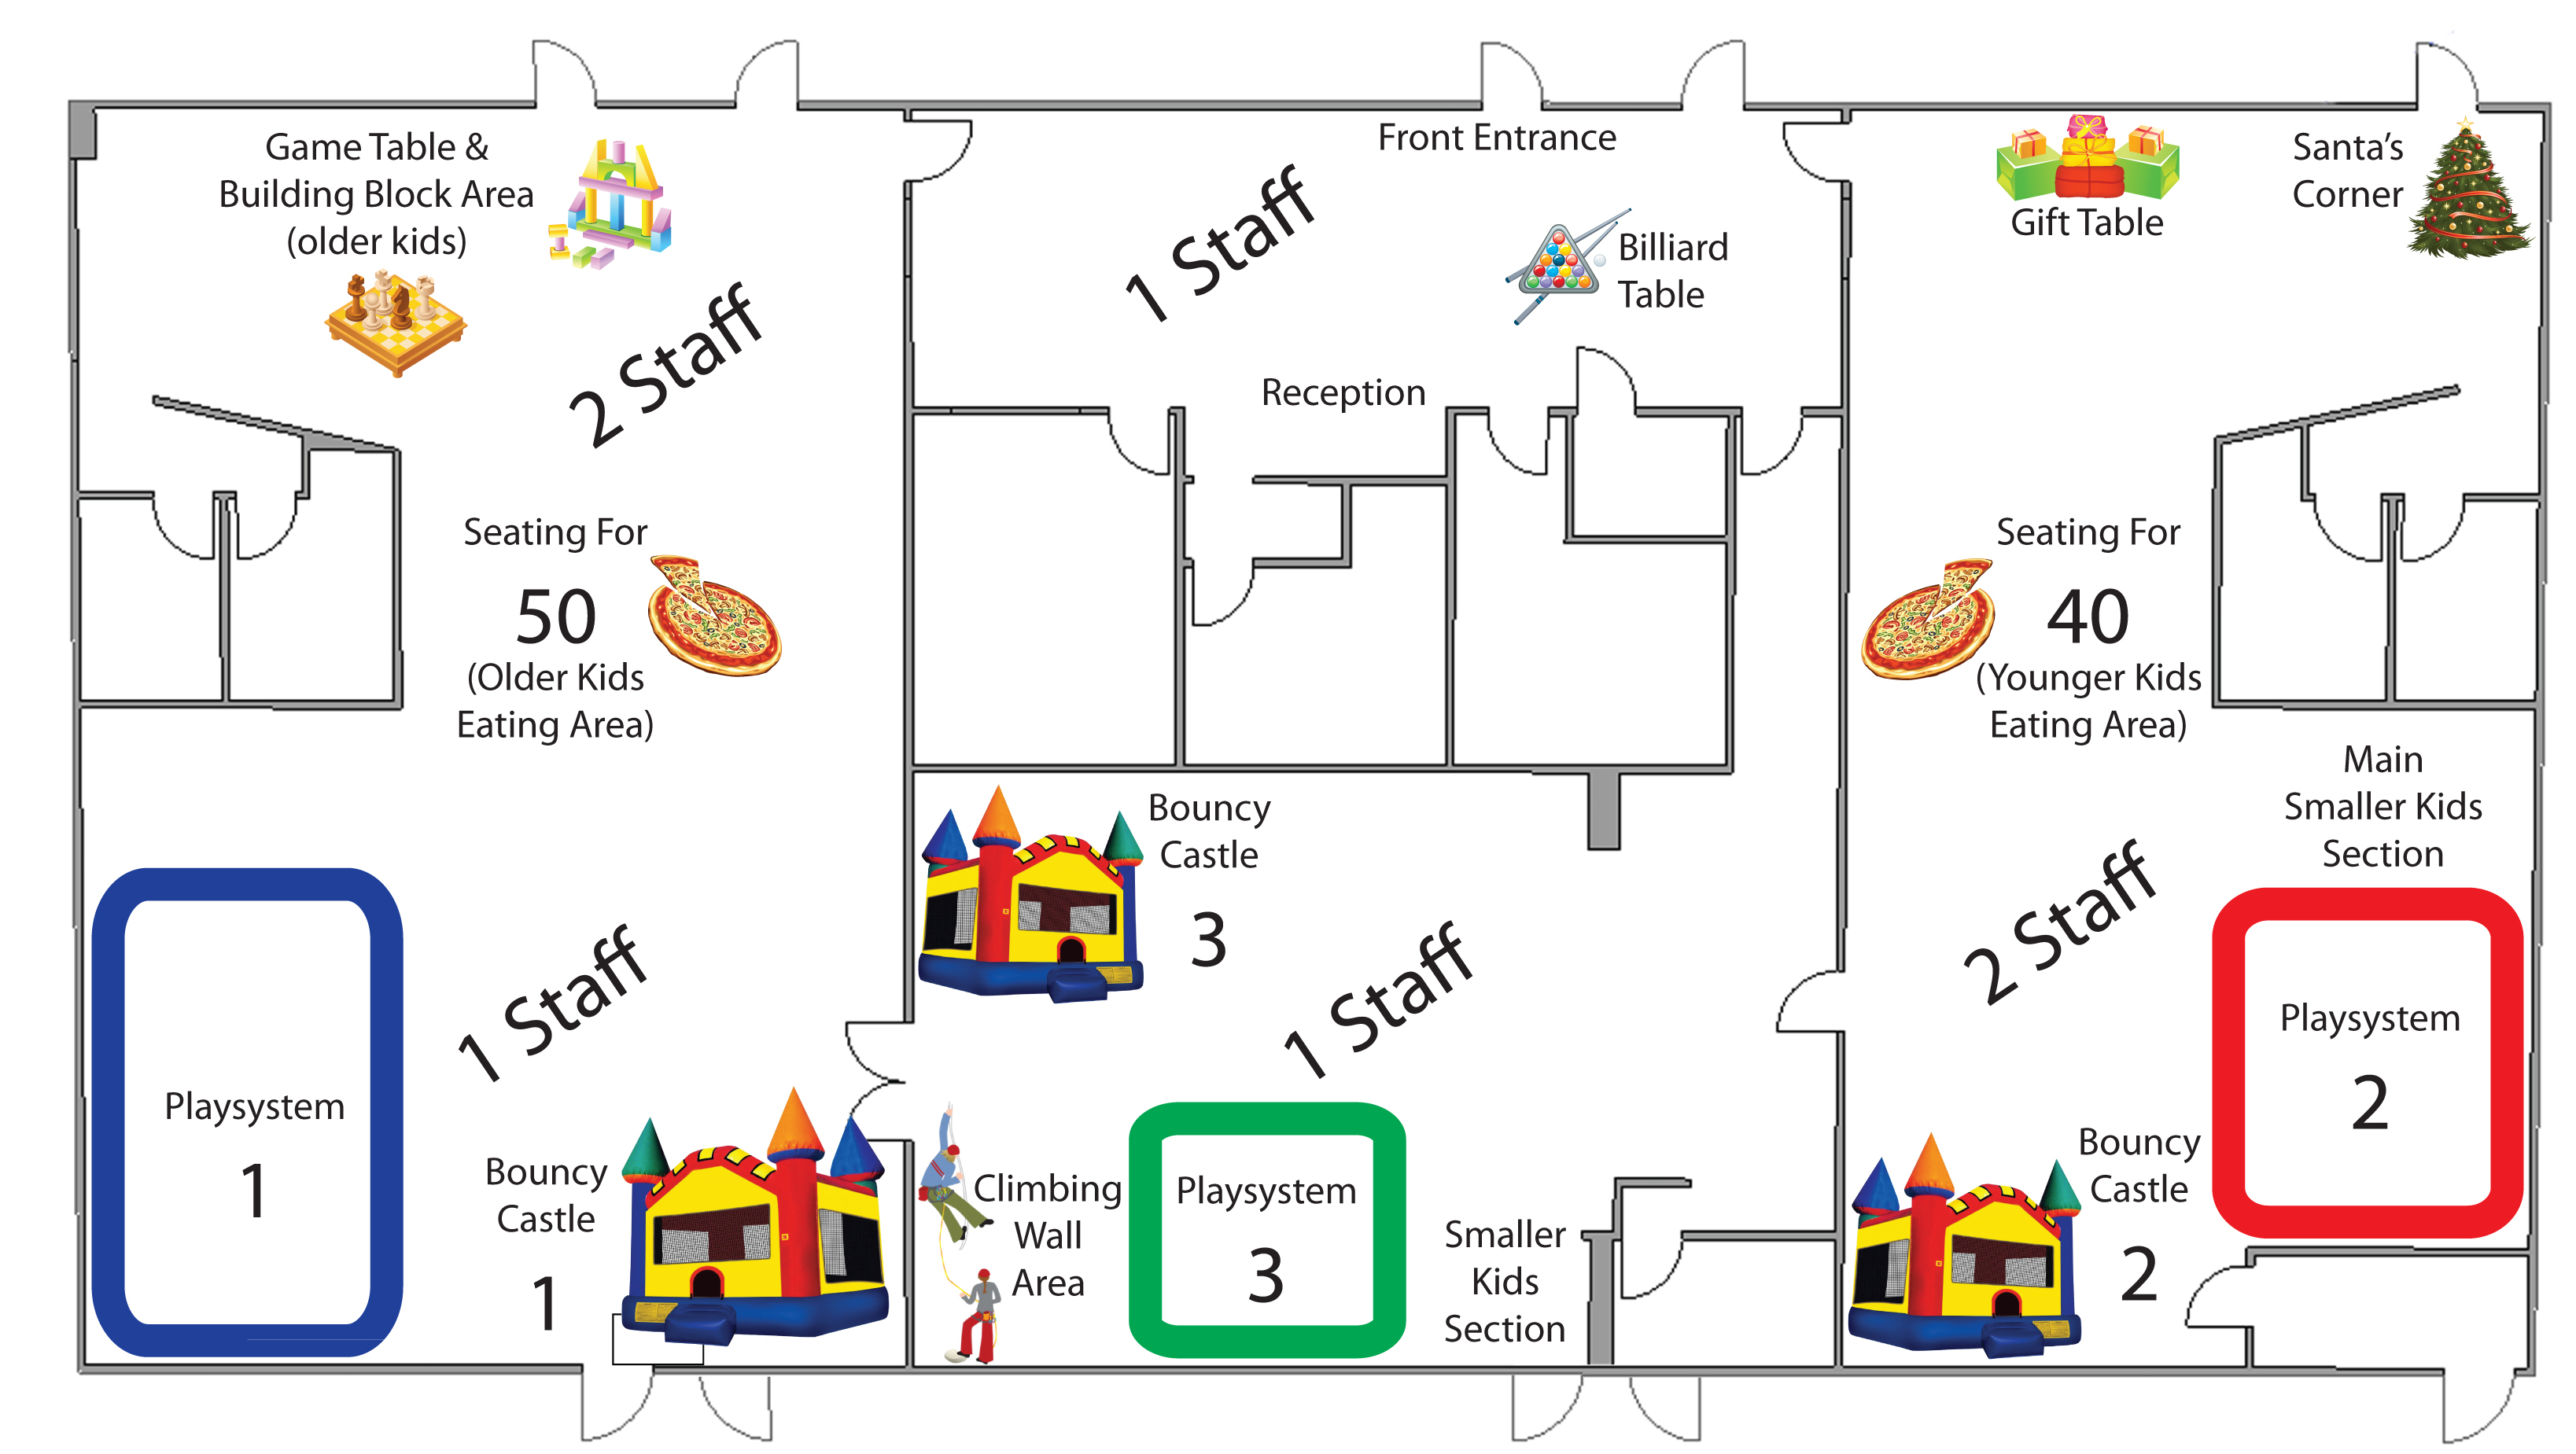 Corporate Events Toronto Indoor Playground Birthday Party Rooms - Childrens birthday parties north york